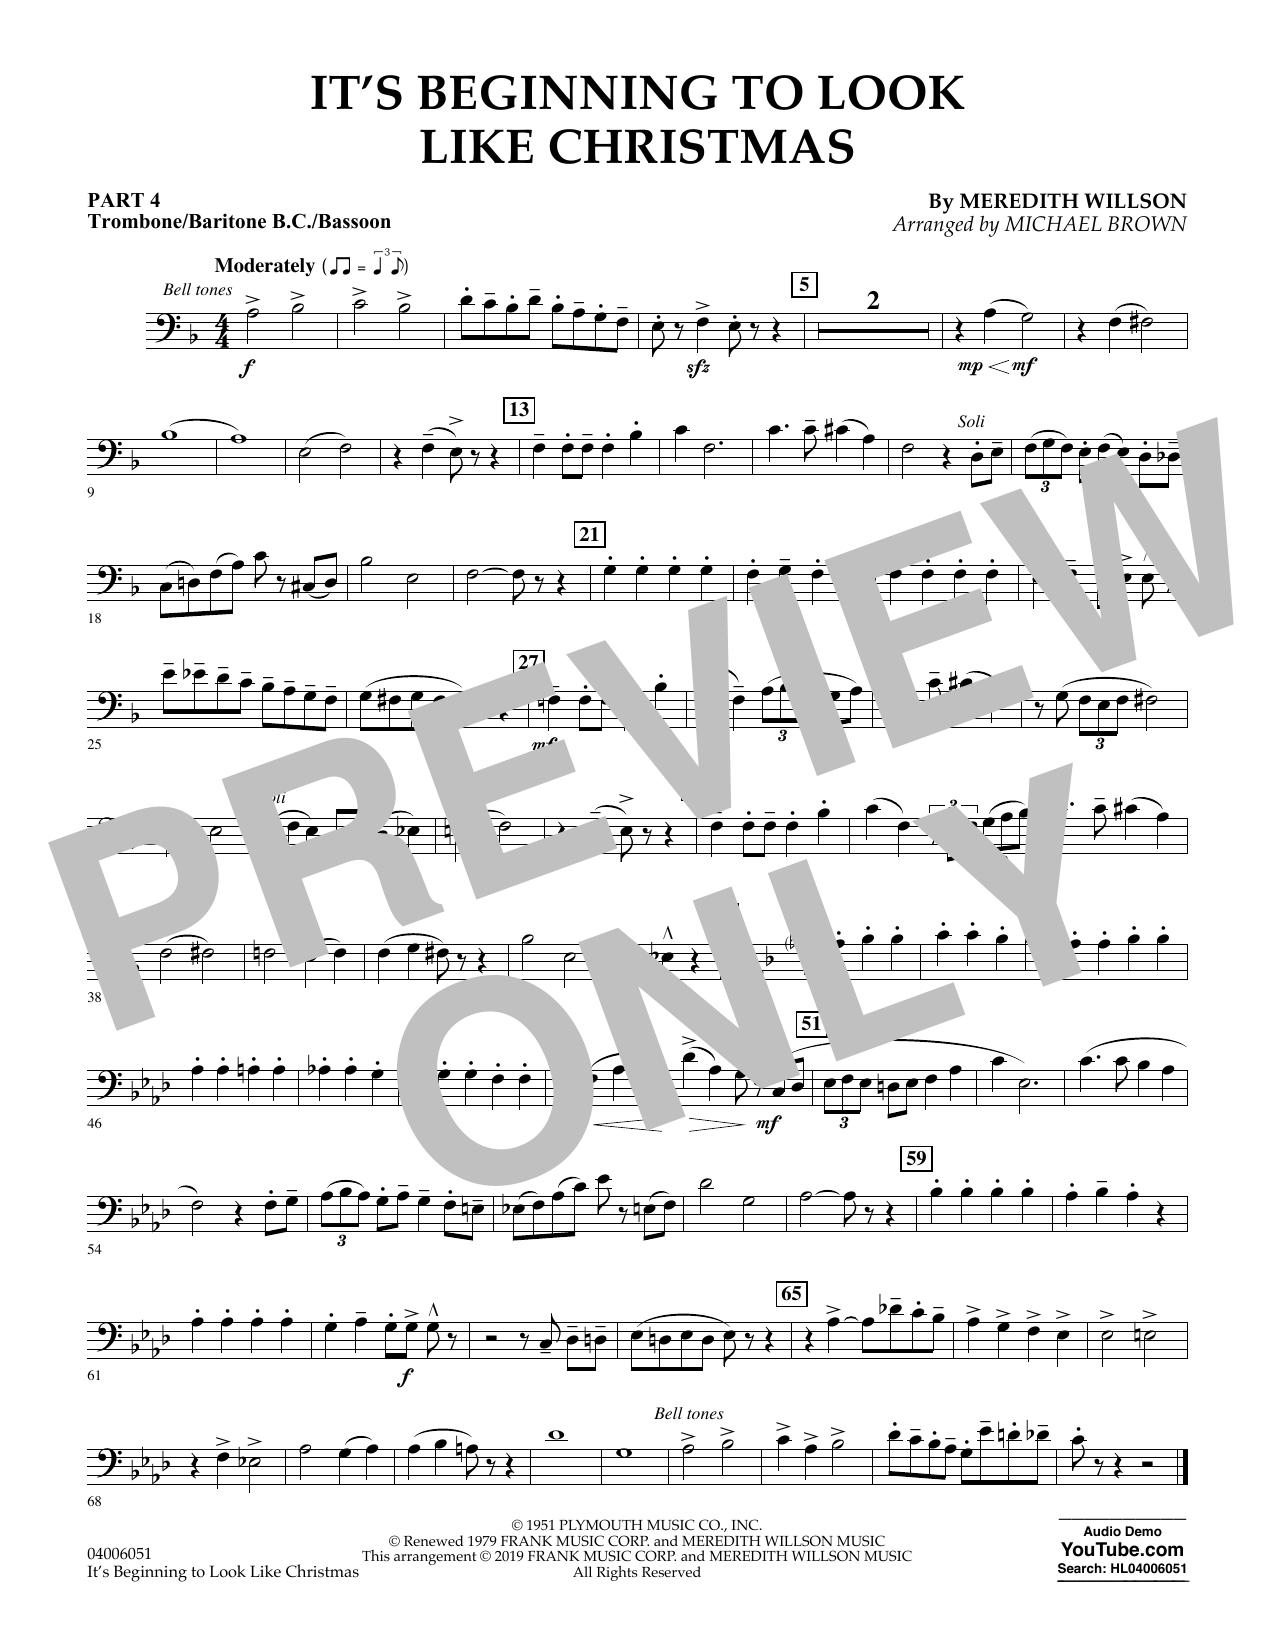 It's Beginning to Look Like Christmas (arr. Michael Brown) - Pt.4 - Trombone/Bar. B.C./Bsn. (Flex-Band)